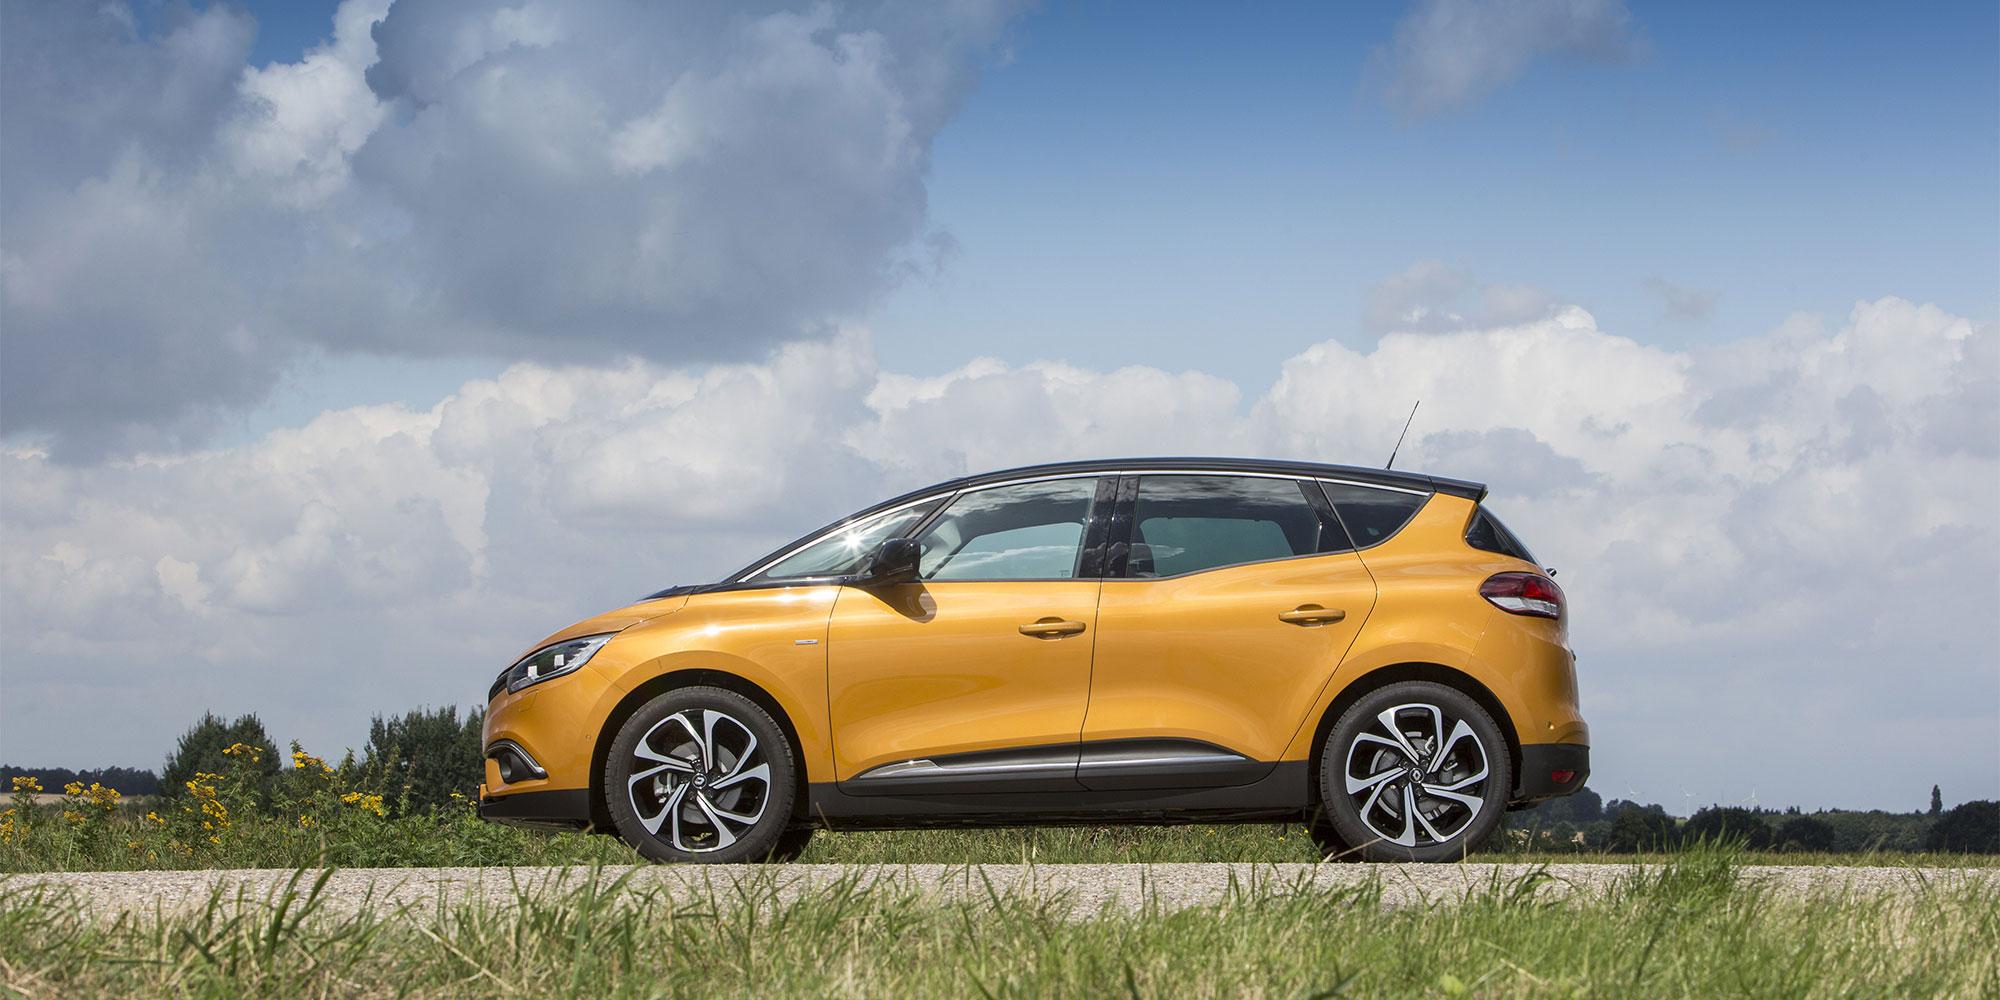 Scénic, Kompaktvan, Renault, 2016